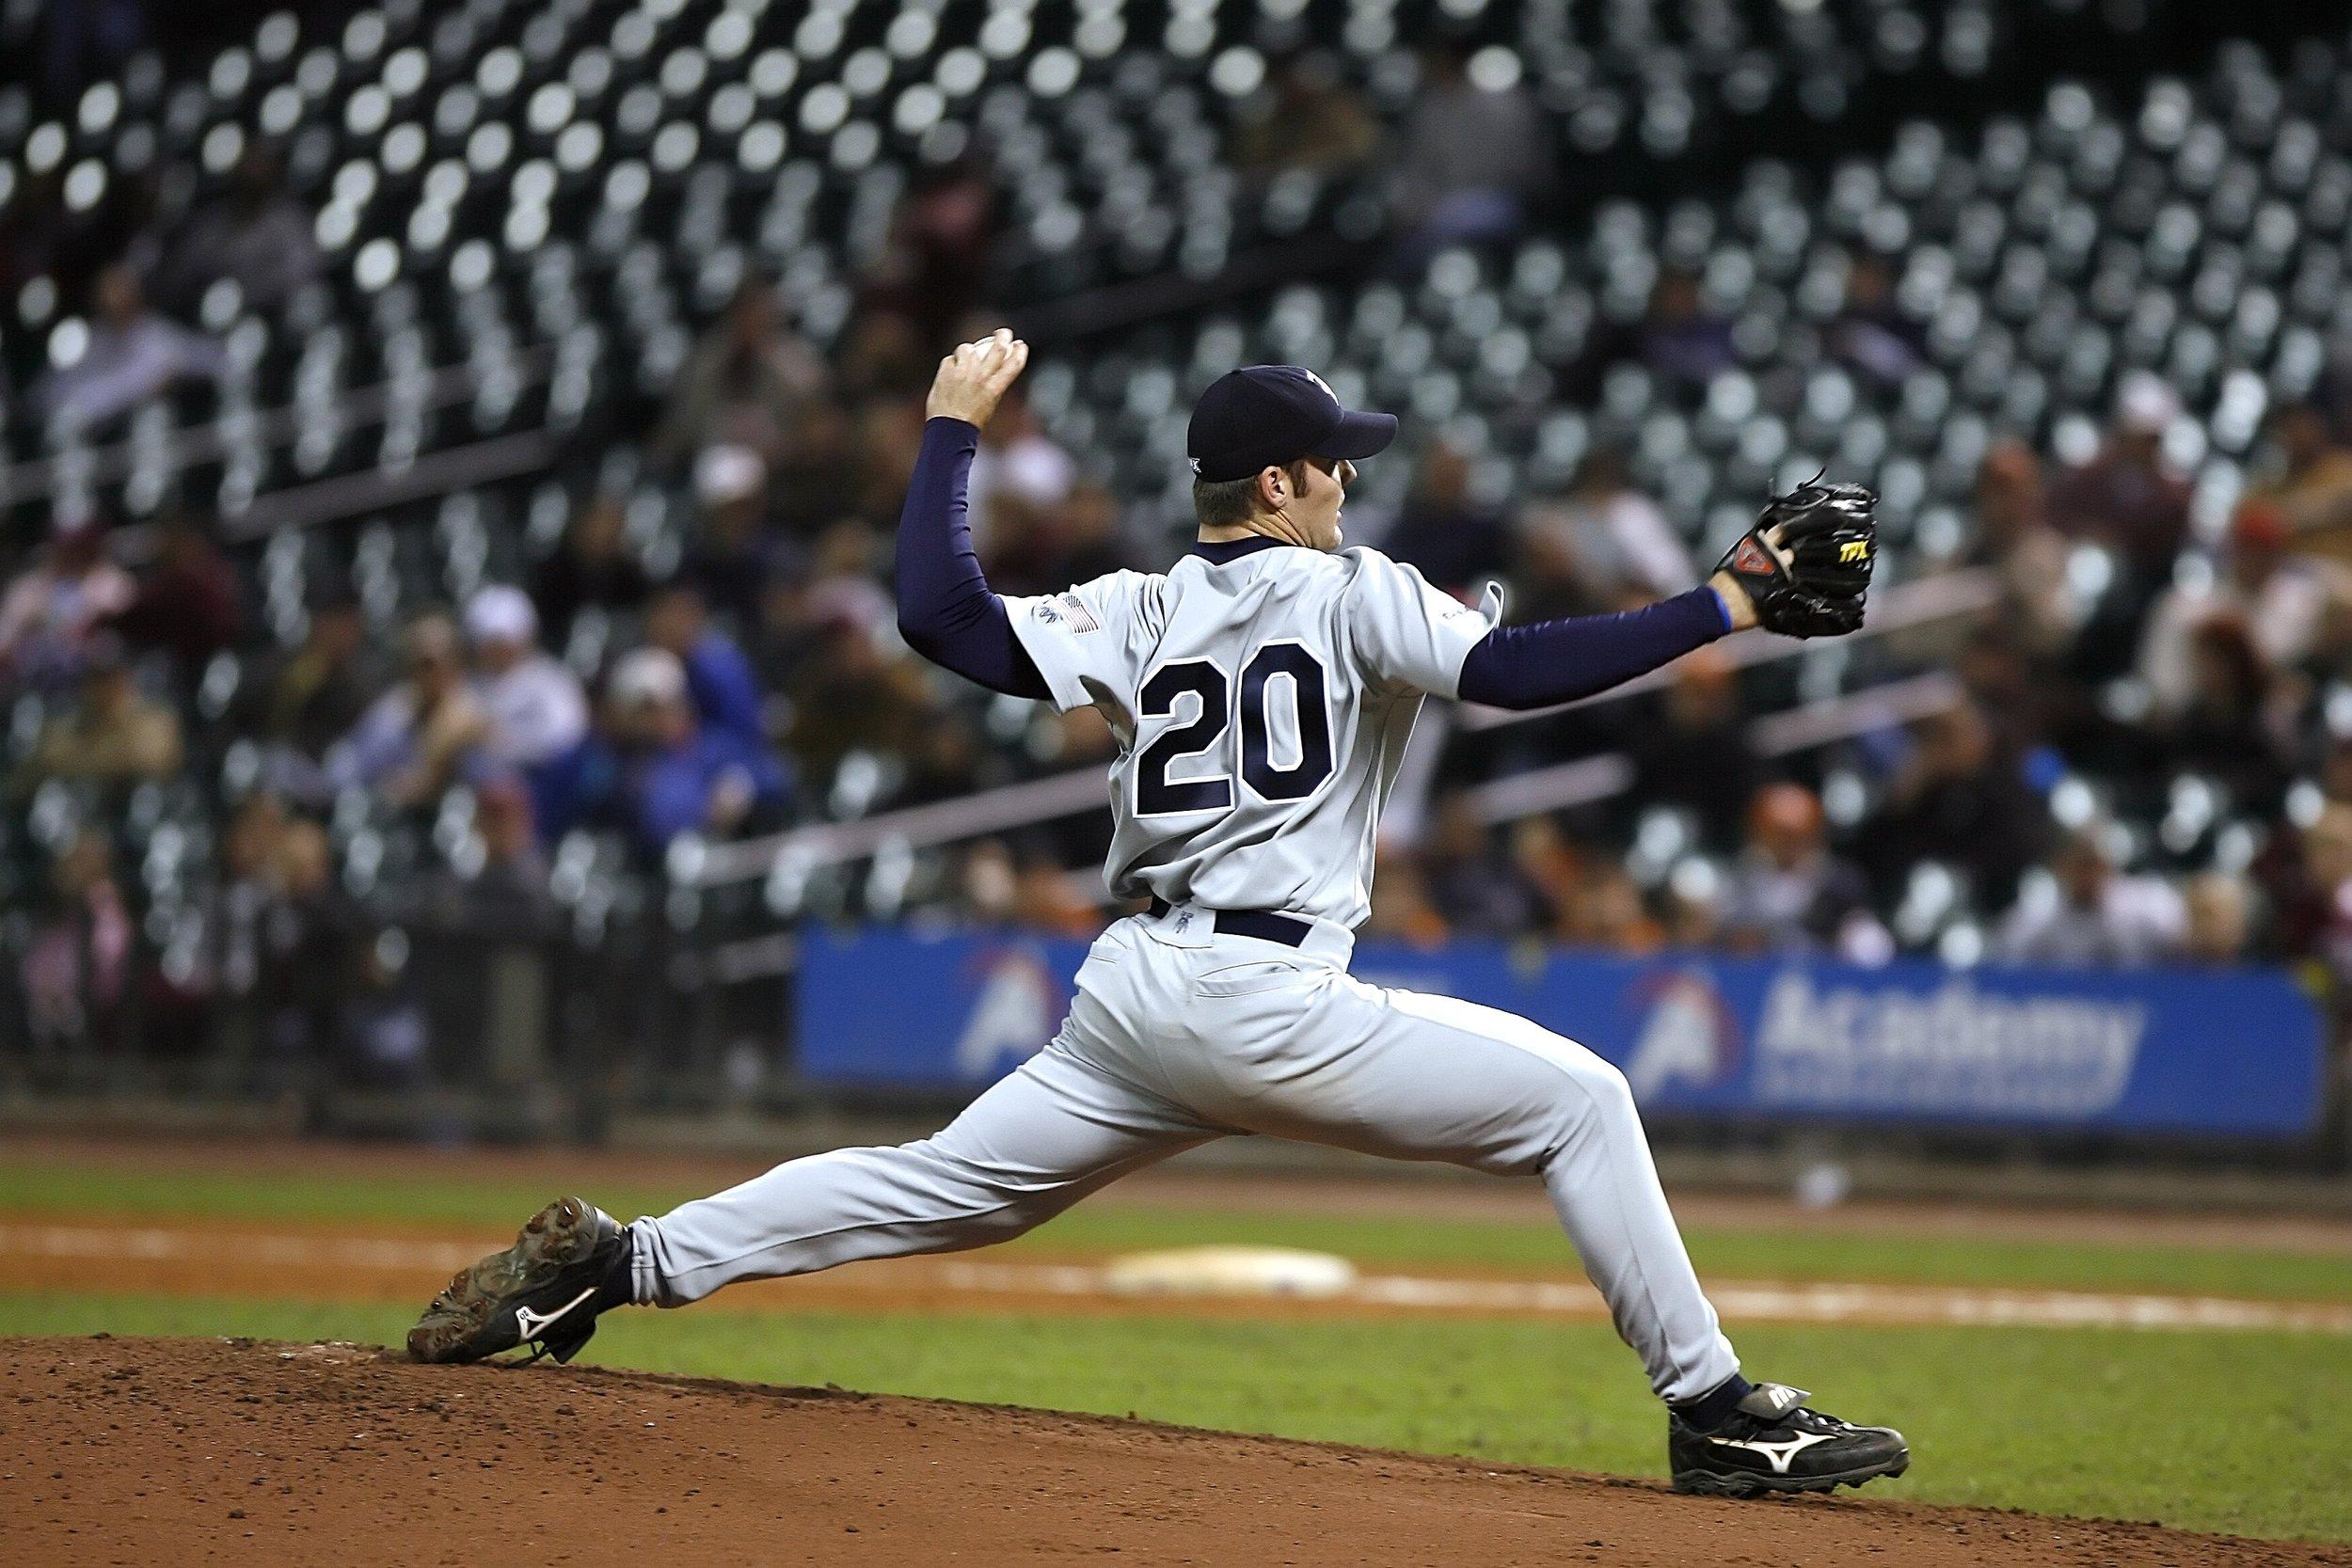 leg-strengthening-baseball-arm-injury